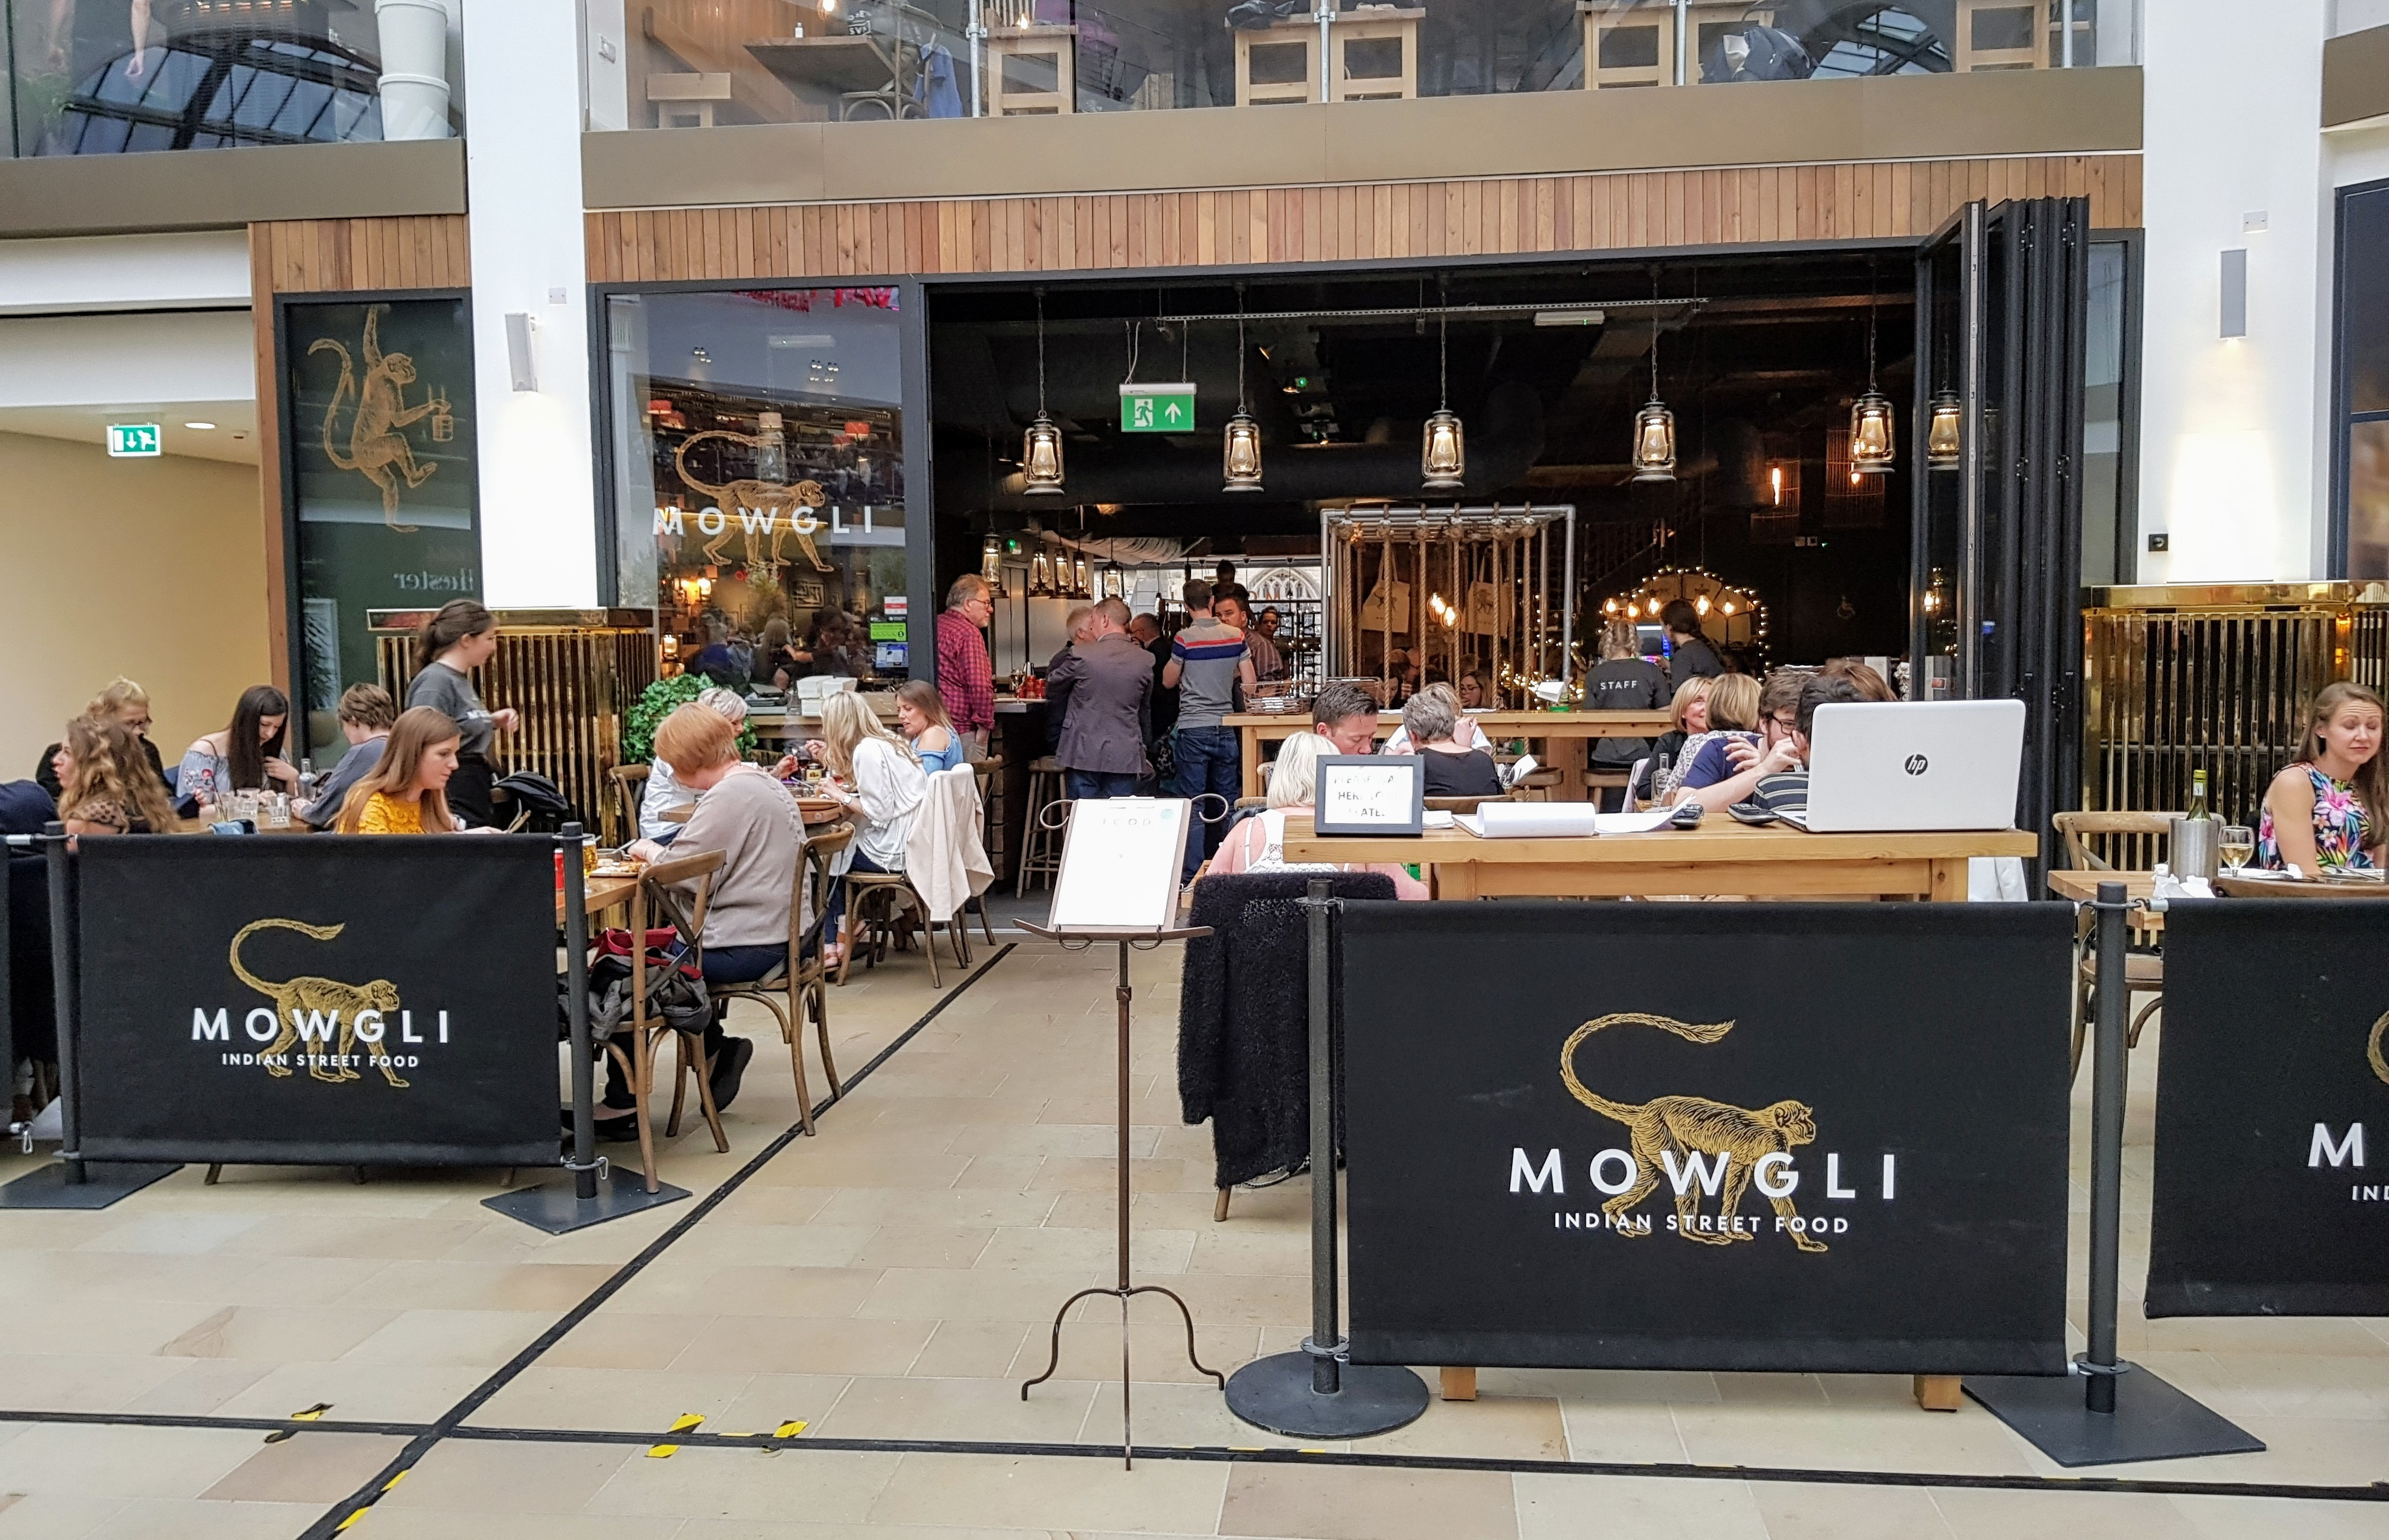 Review Mowgli Street Food Manchester Kip Hakes